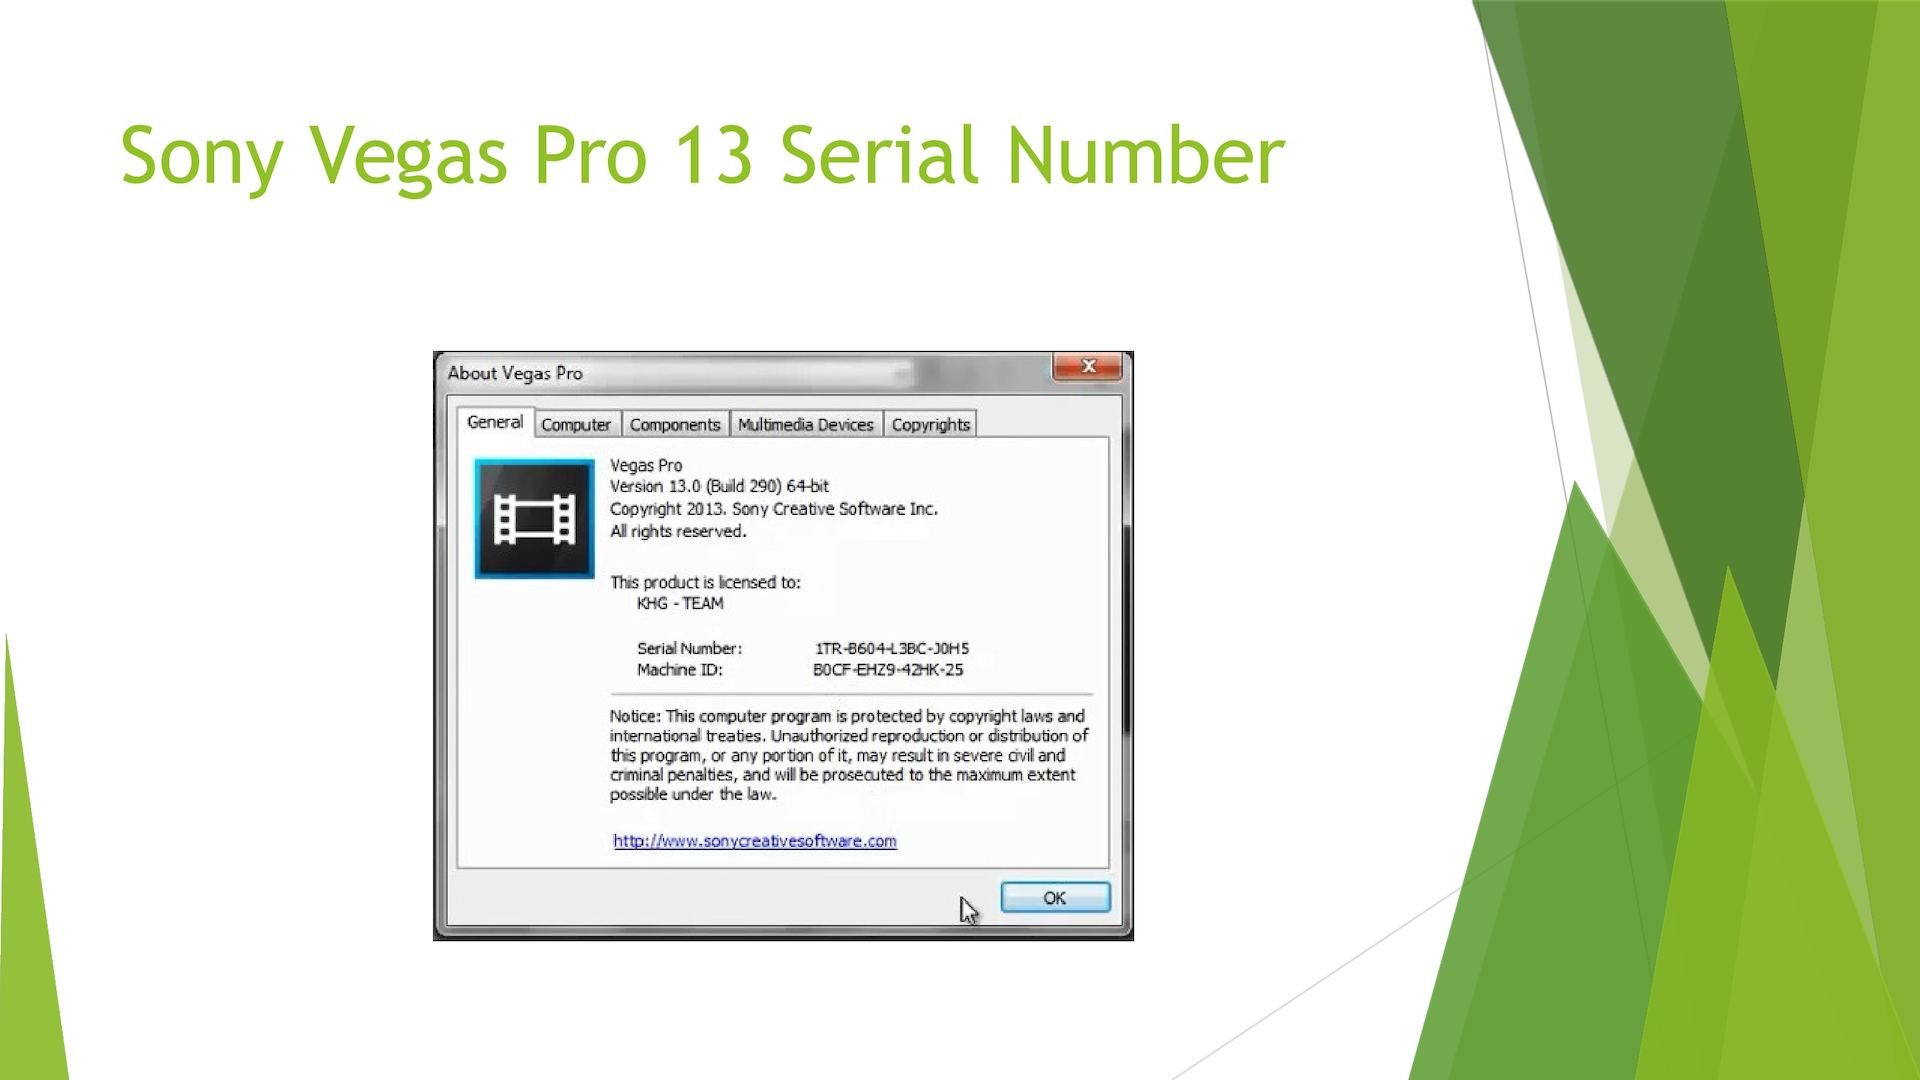 Sony Vegas Pro 16.0.261 registration code